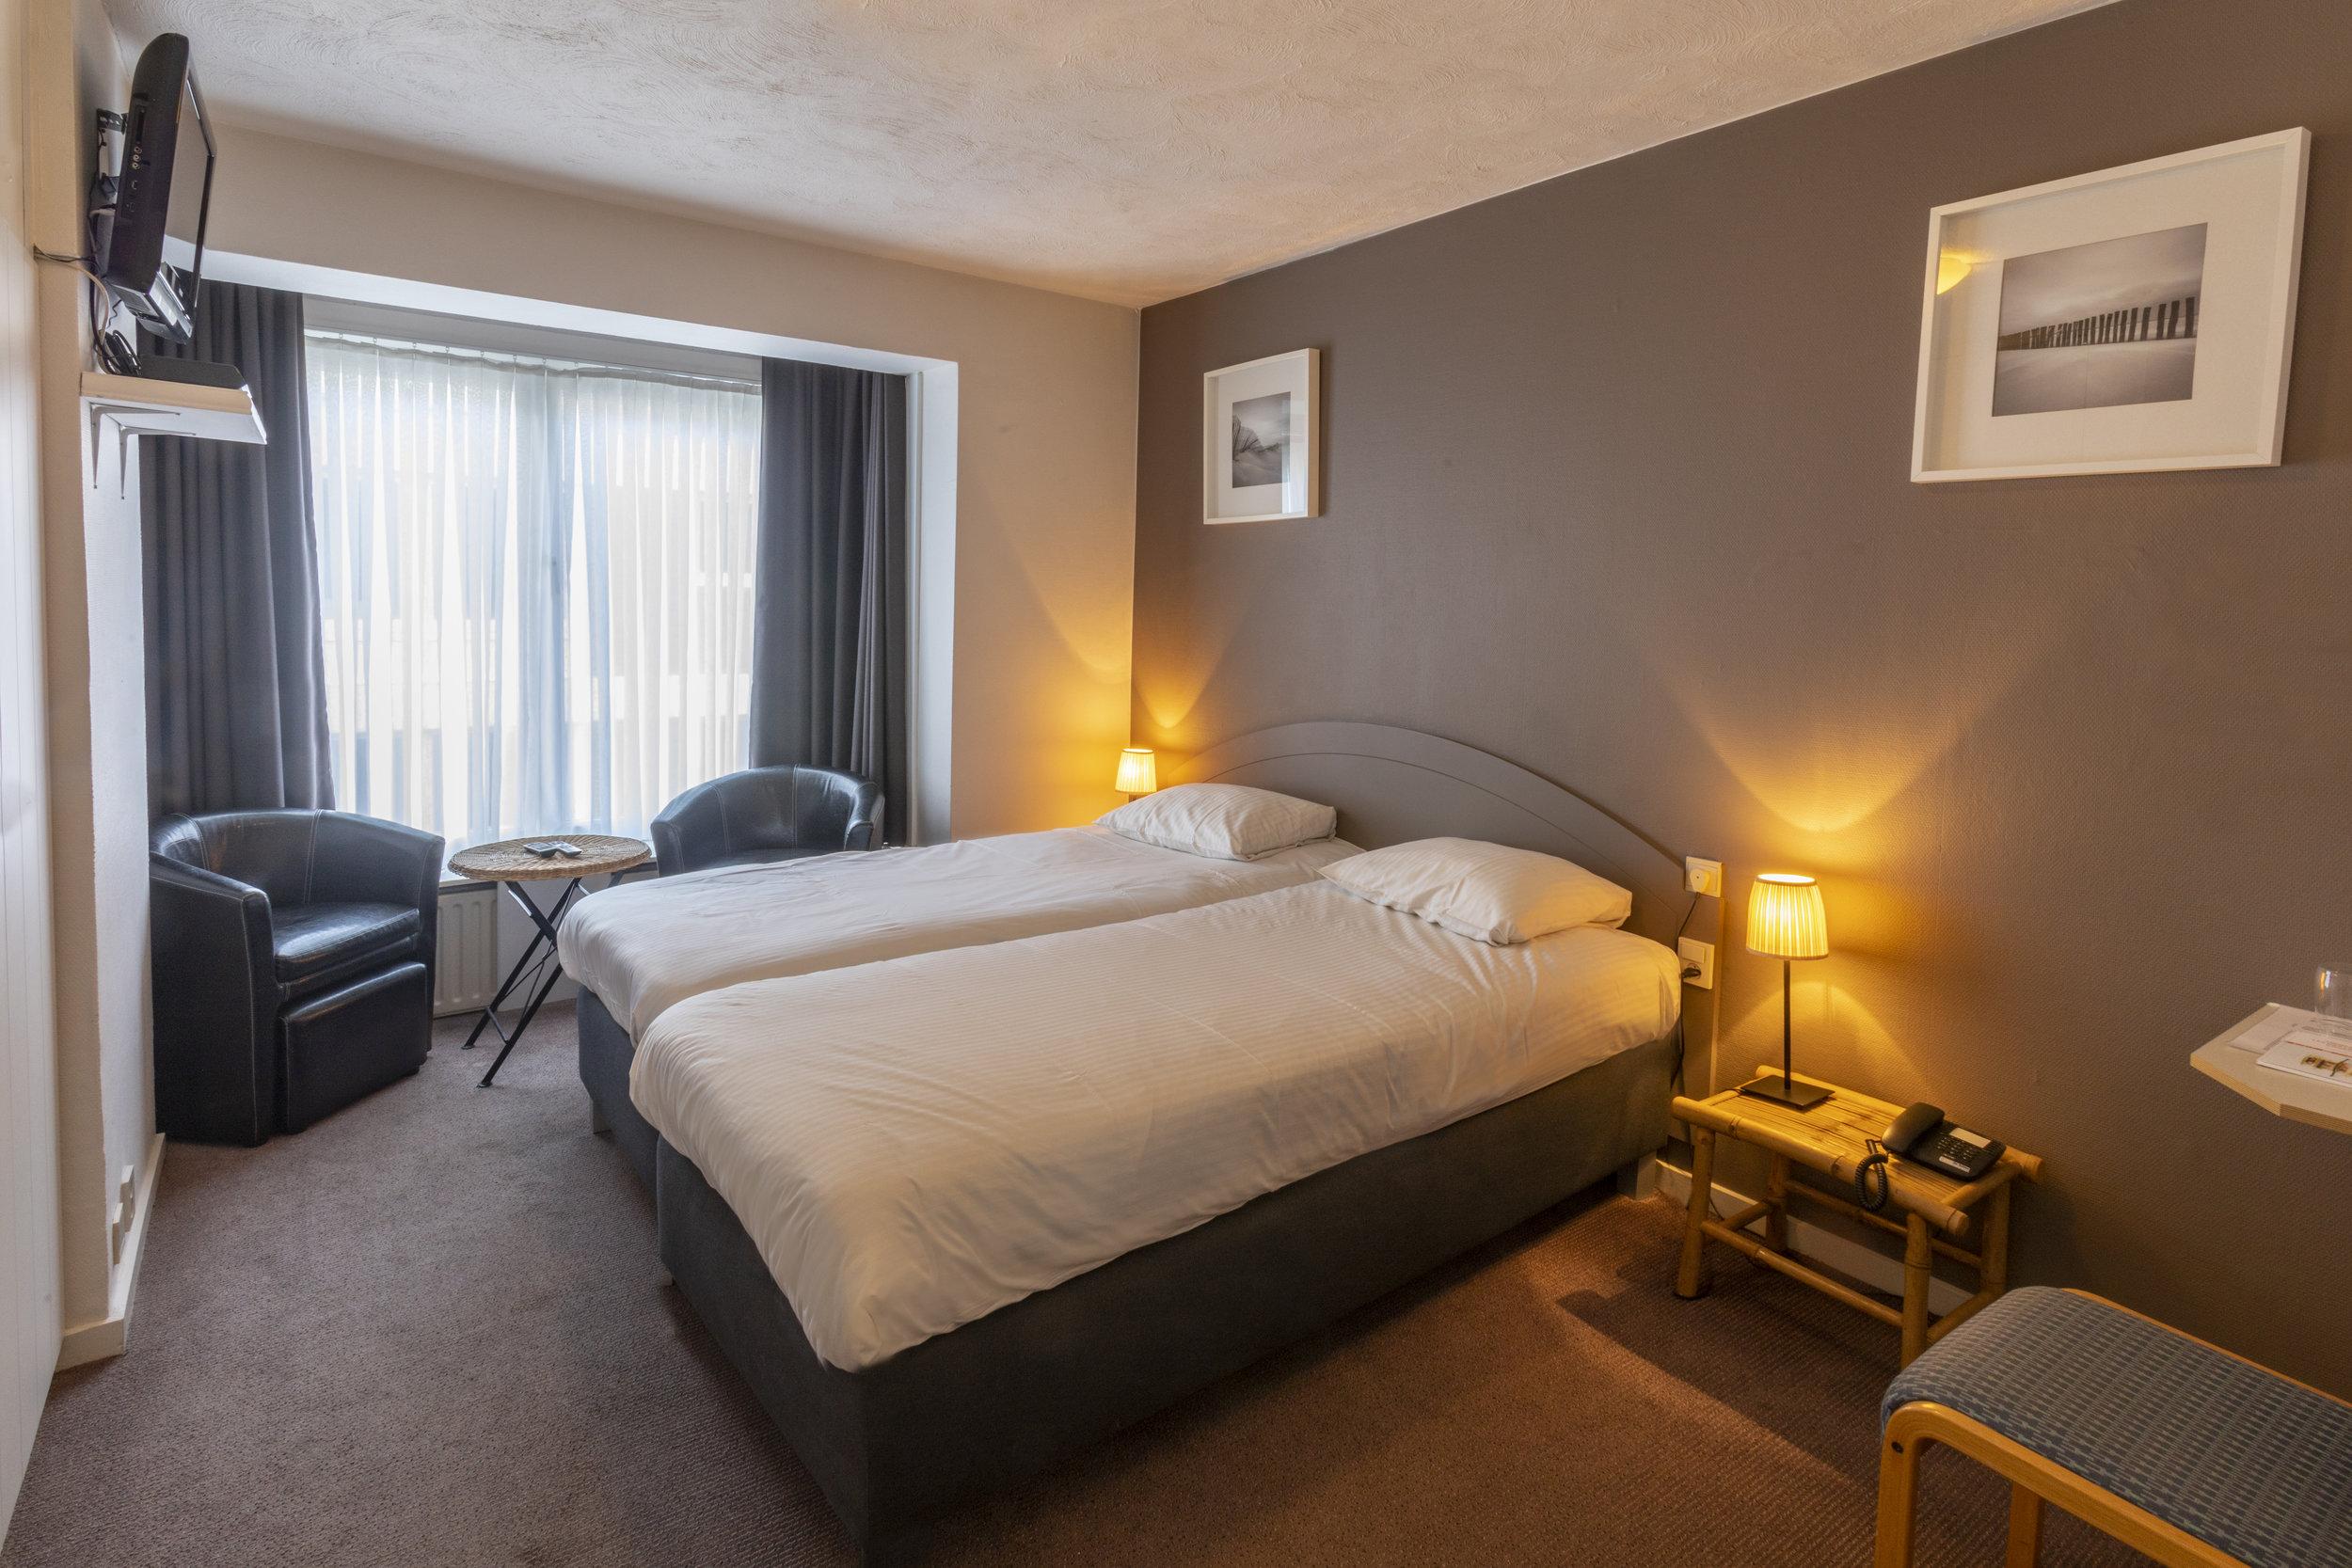 4 TER DUINEN HOTEL Jan D'Hondt © 2019.jpg